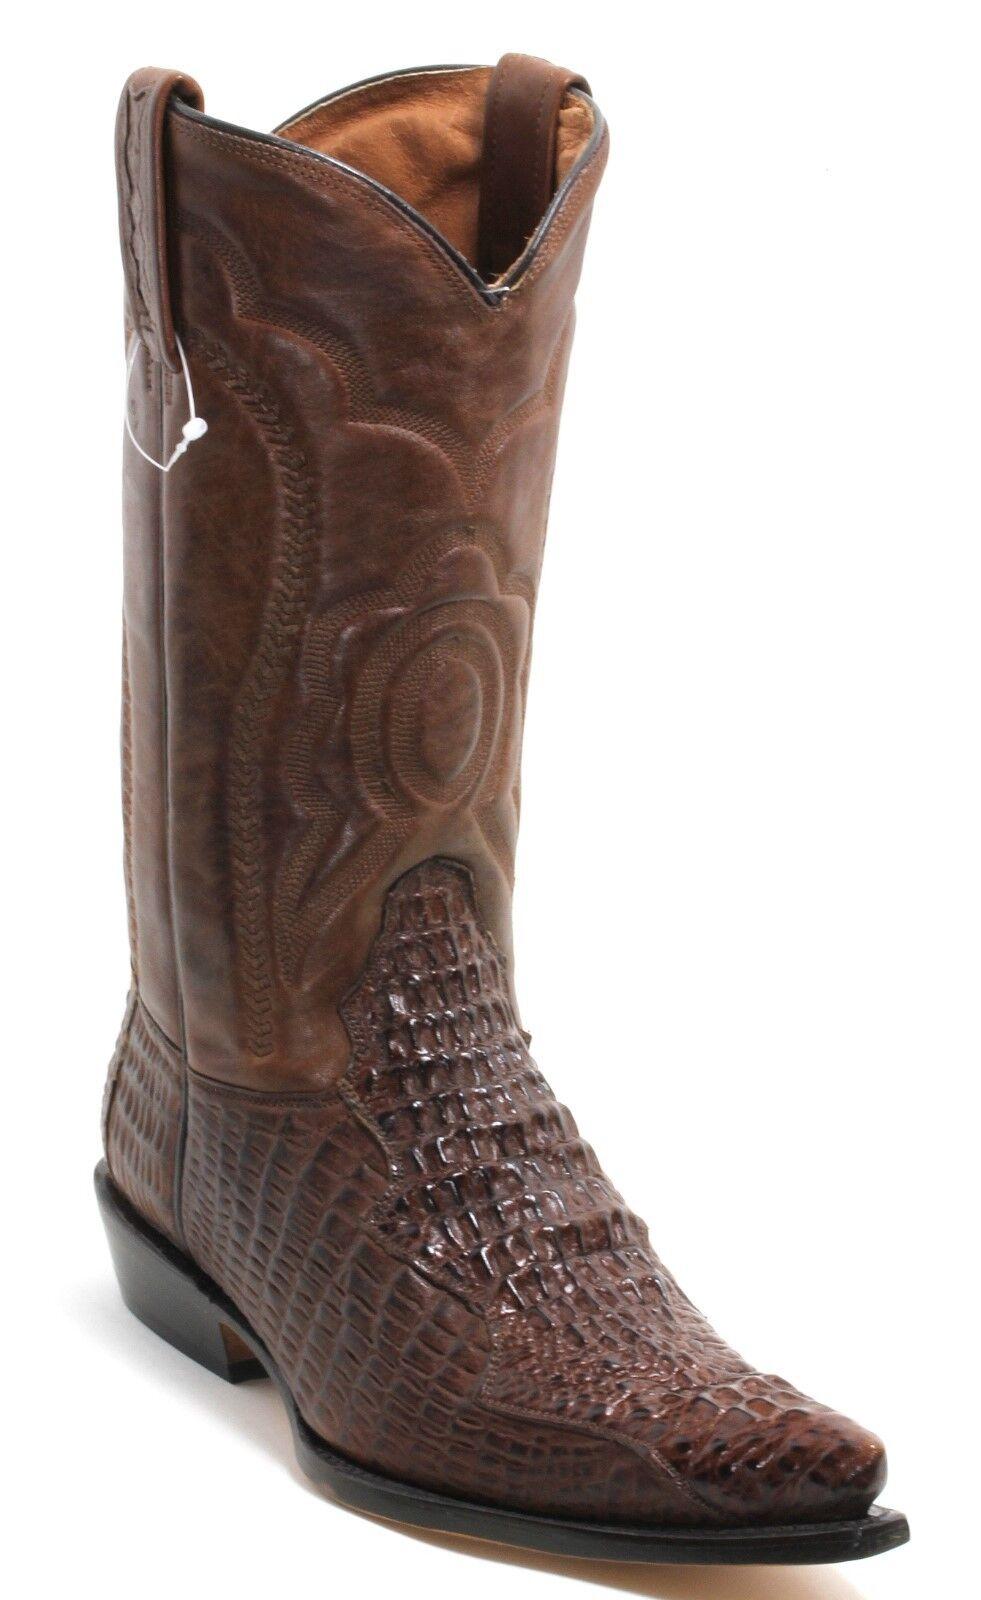 12 Cowboystiefel Westernstiefel Texas Boots Stickerei Catalan Style Krokodil 45